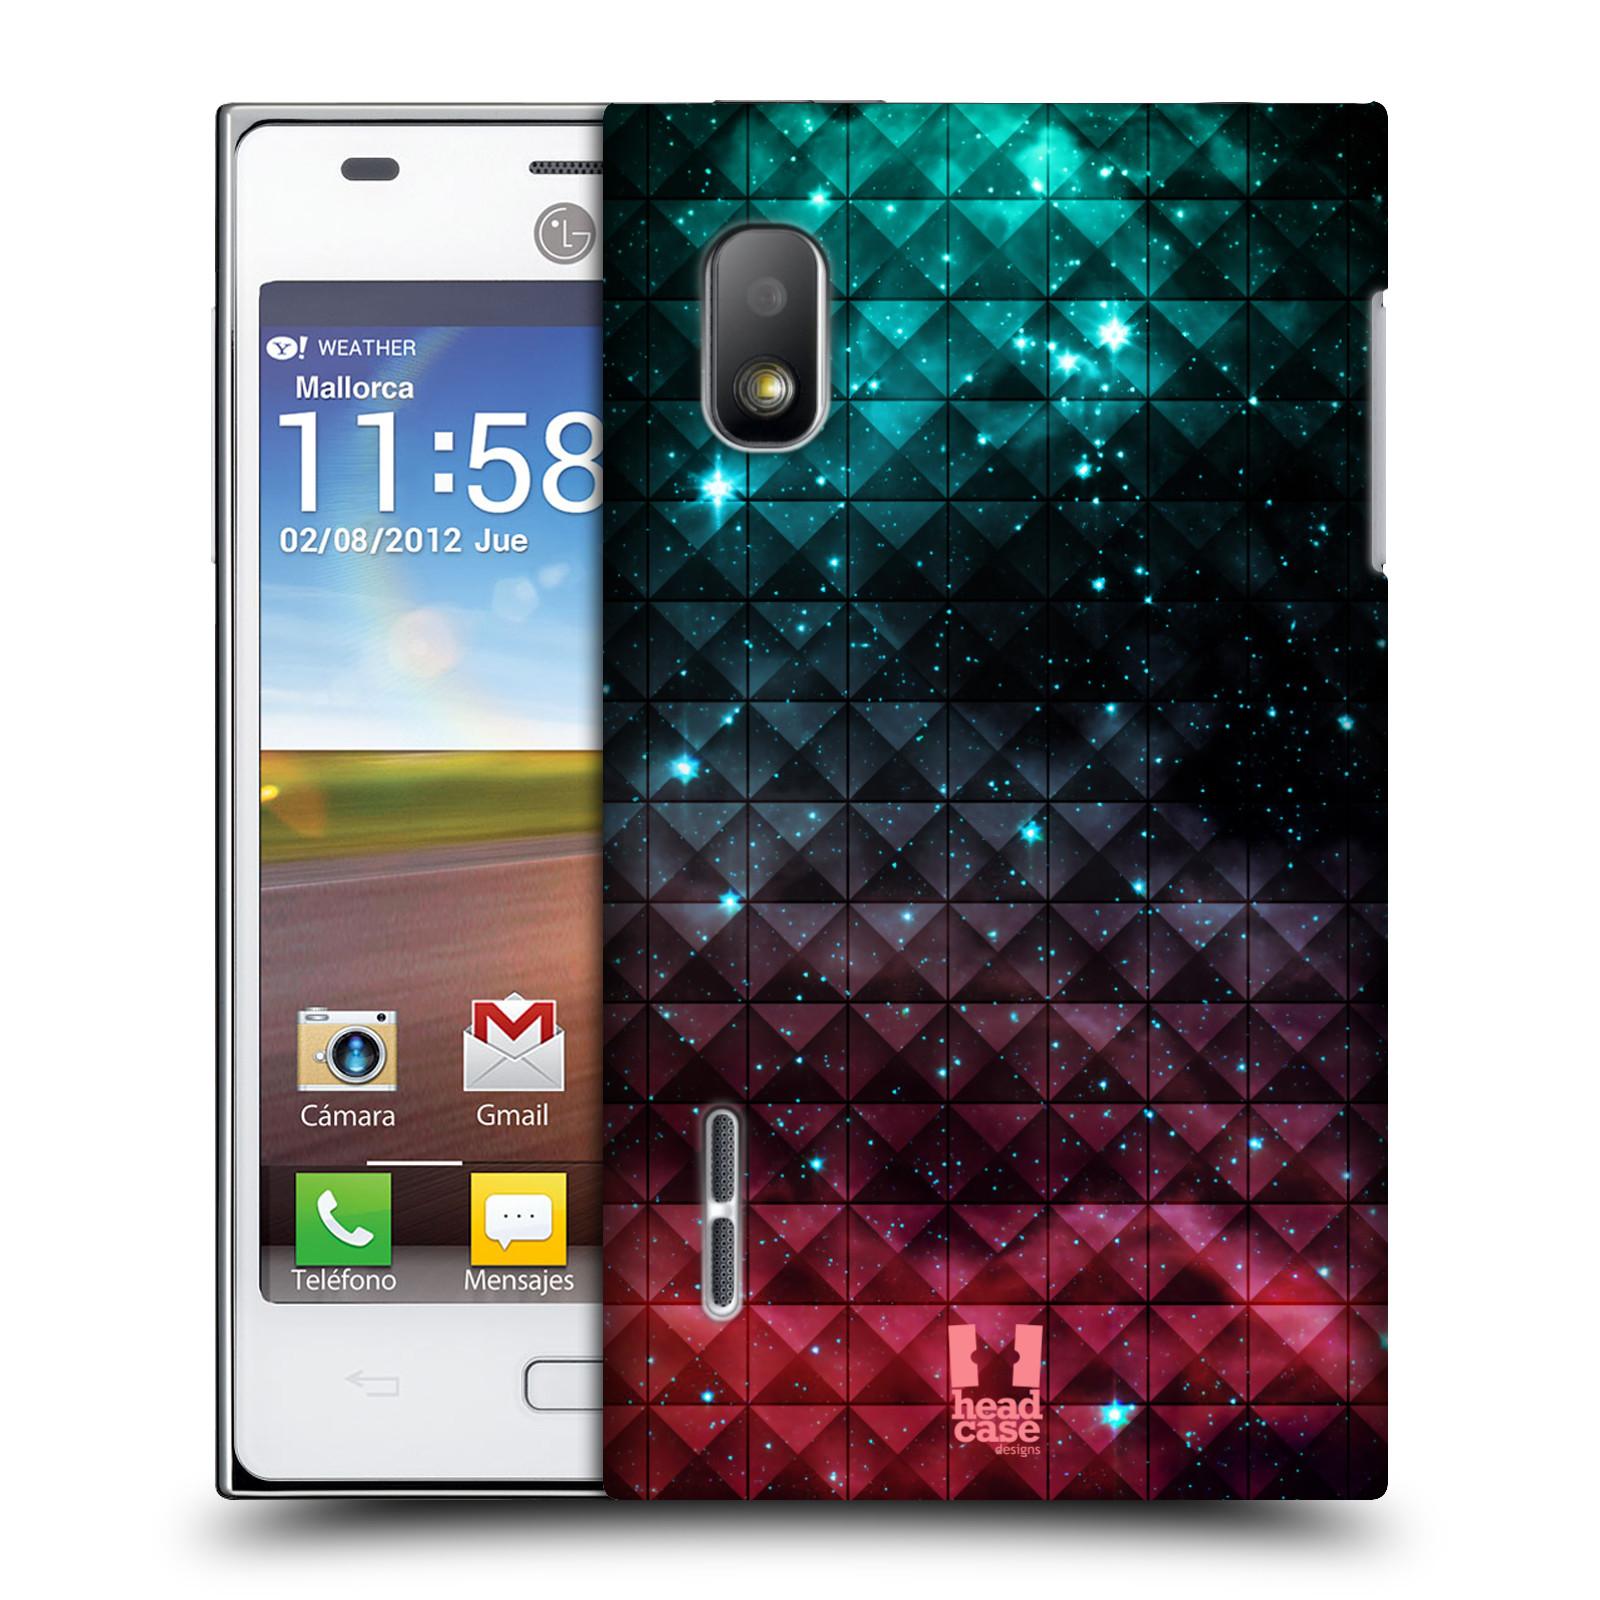 Plastové pouzdro na mobil LG Optimus L5 HEAD CASE OMBRE SPARKLE (Kryt či obal na mobilní telefon LG Optimus L5 E610)